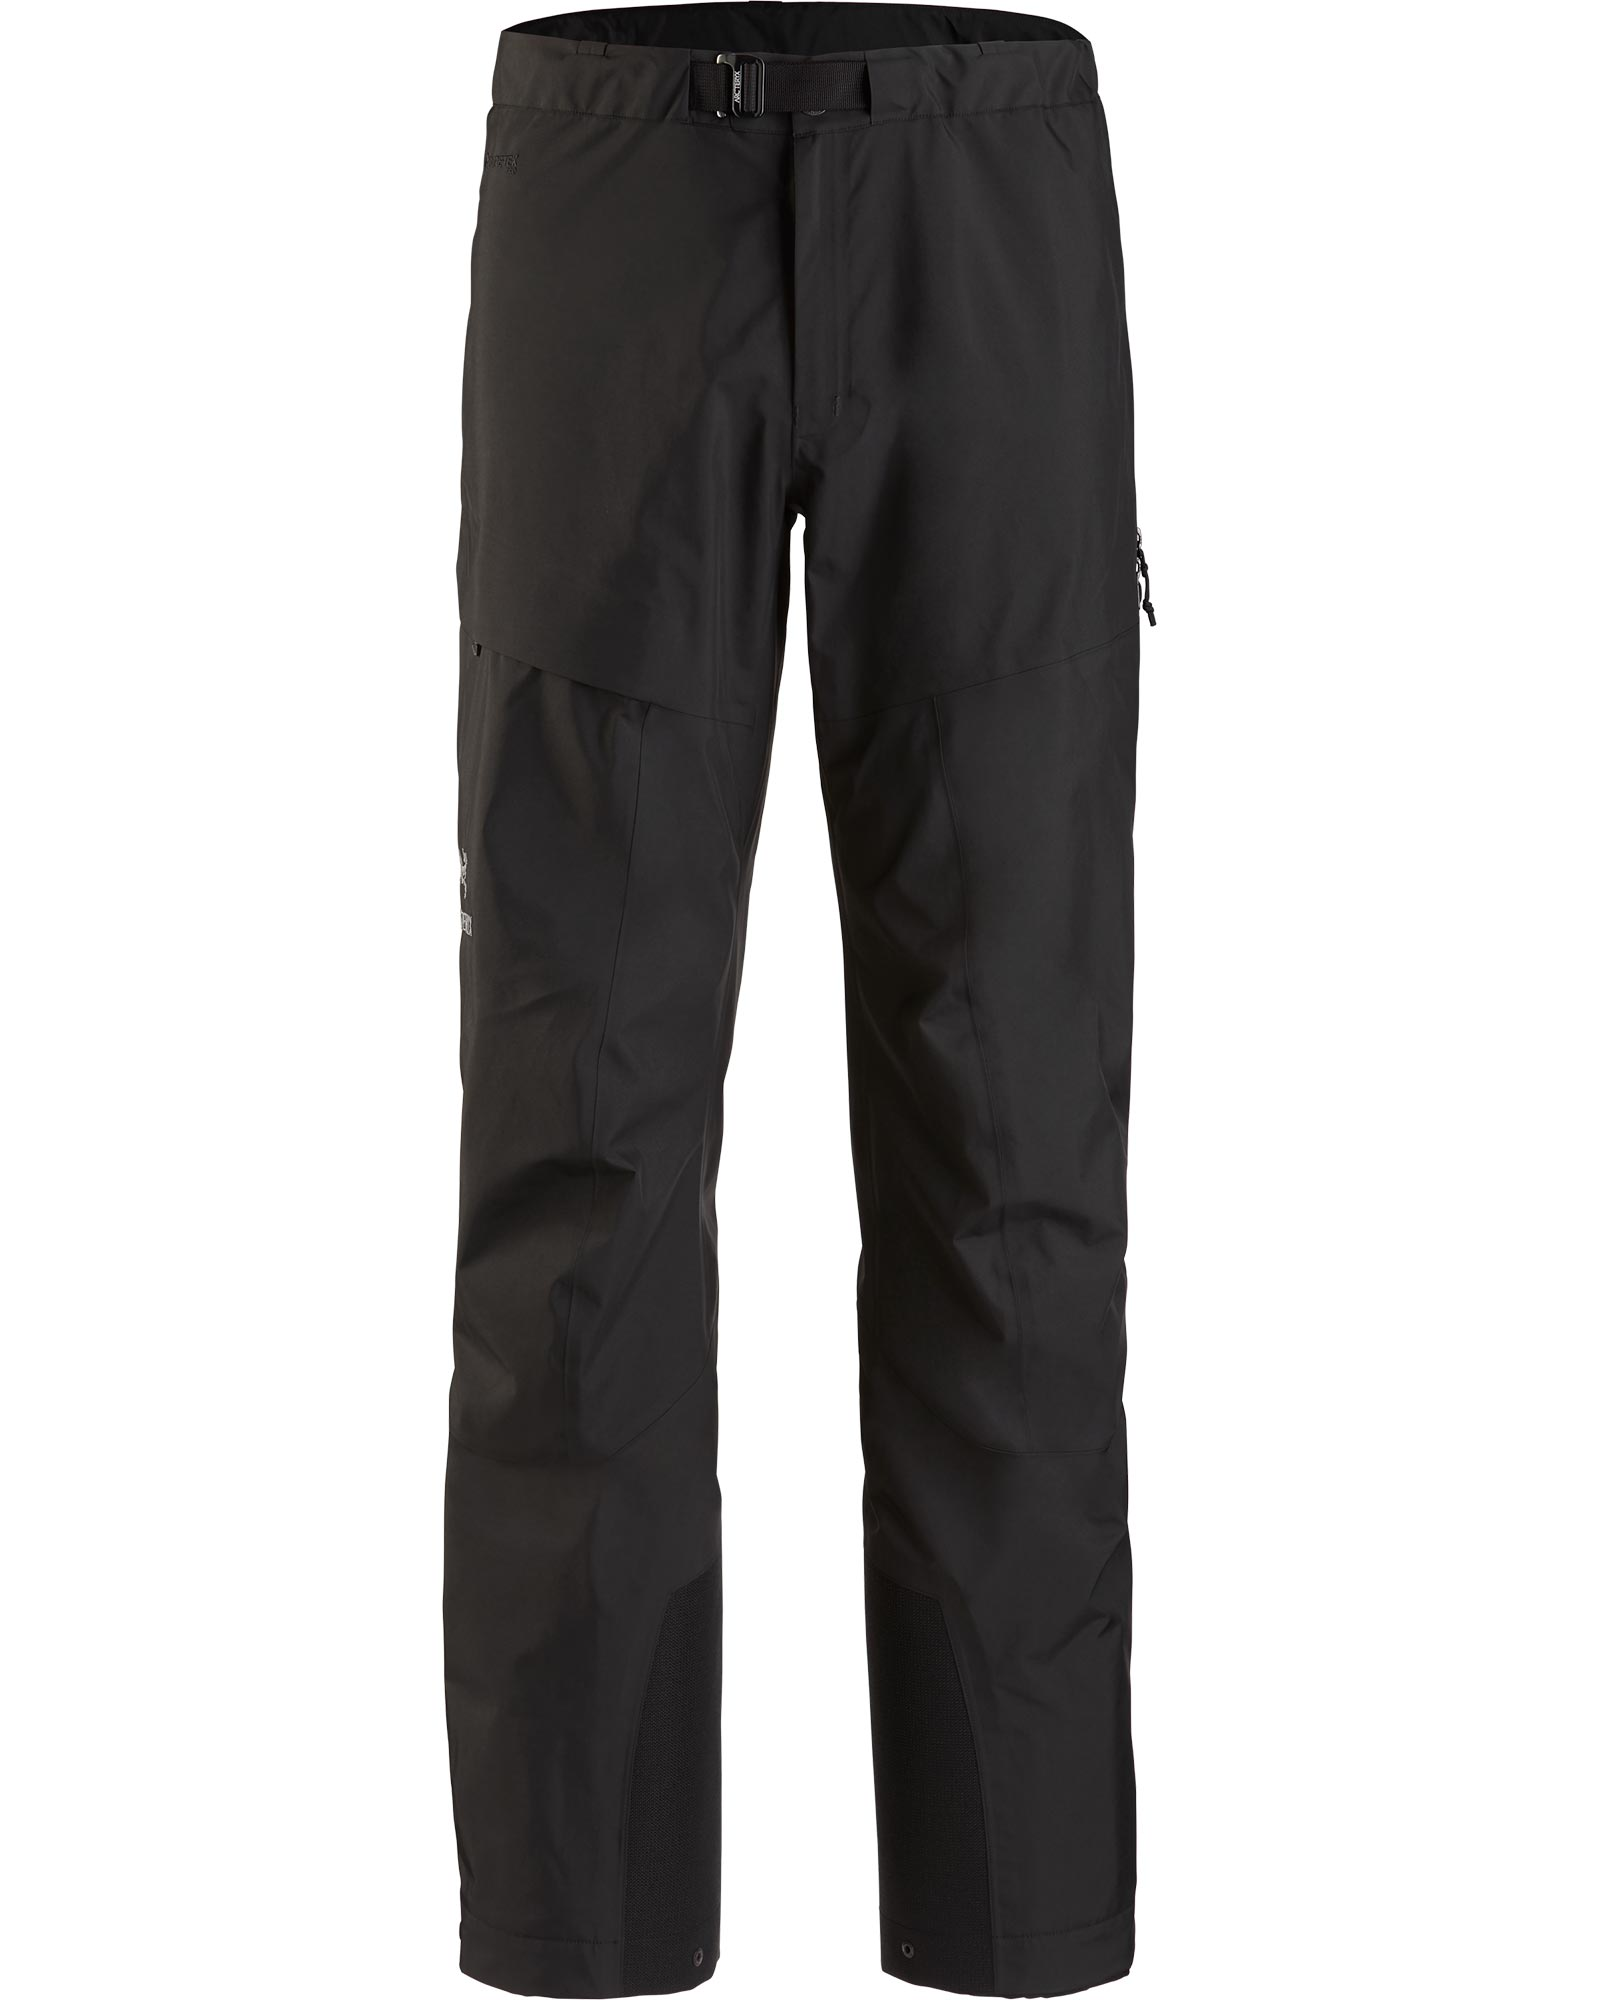 Arc'teryx Men's Beta AR GORE-TEX Pro Pants 0